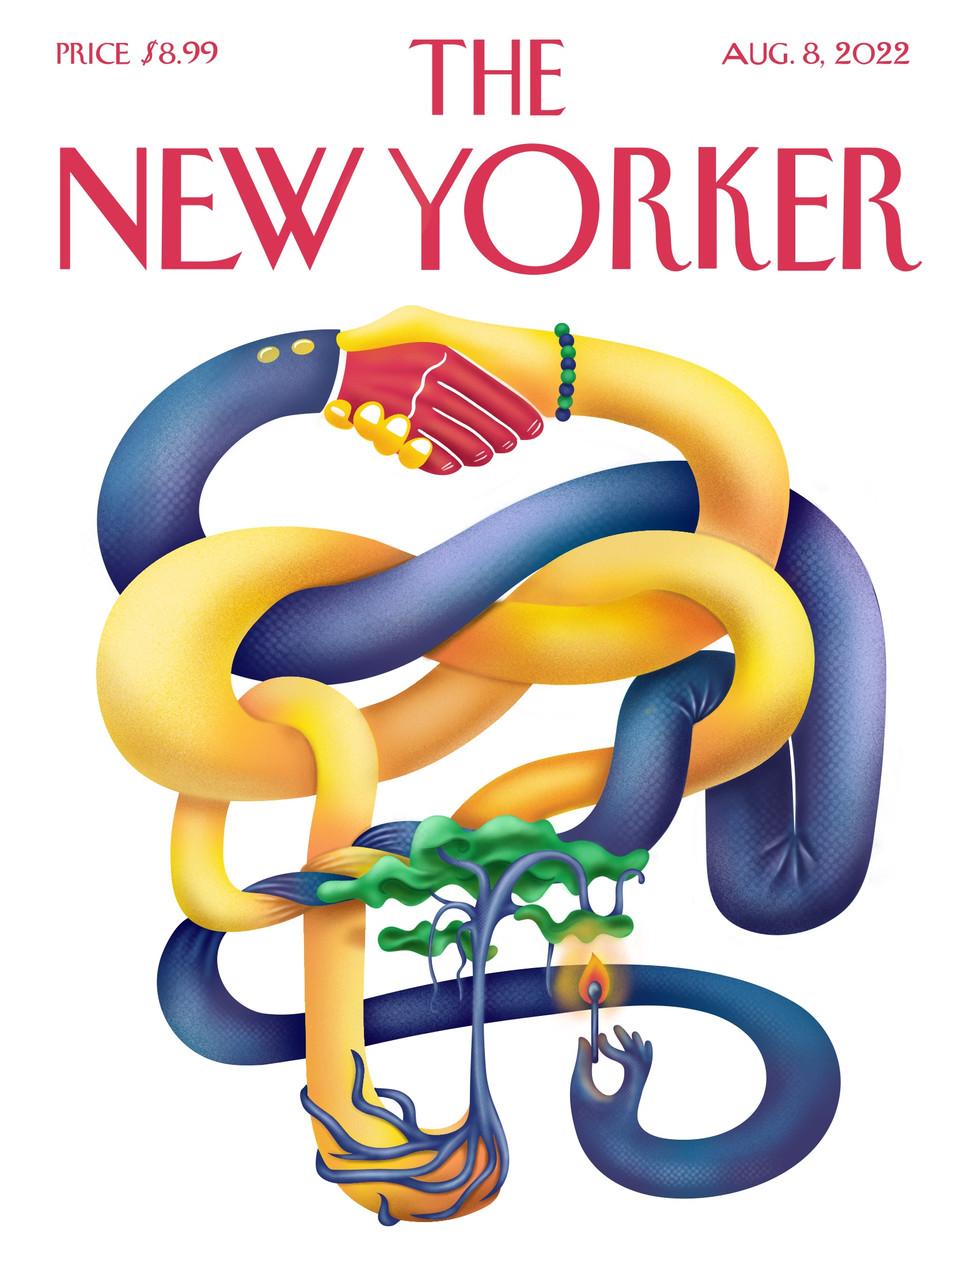 NewYorker - Political